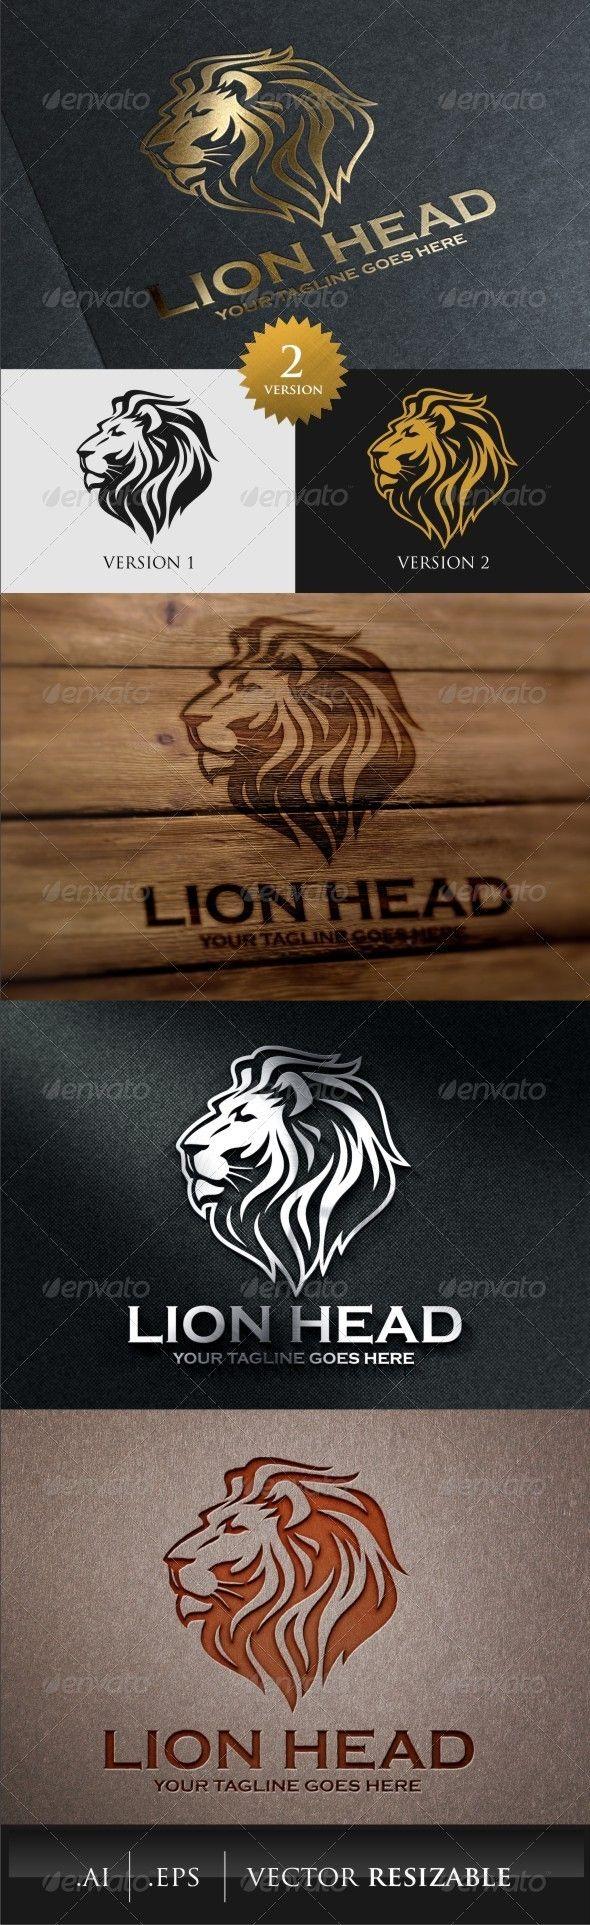 Lion Head Logo Template Animal design, Animal logo and